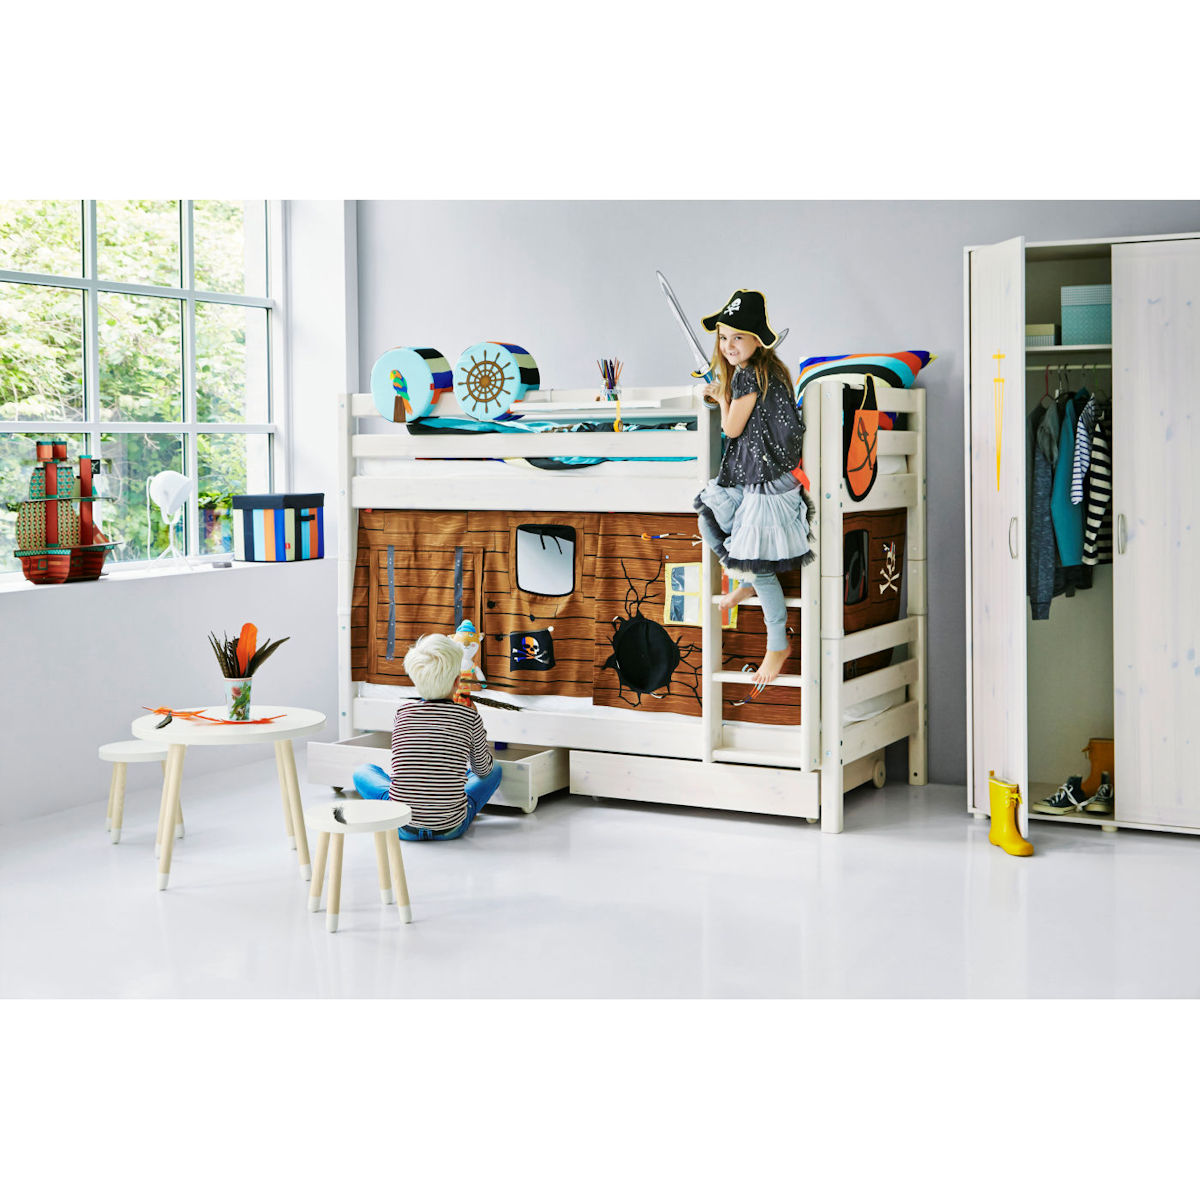 flexa classic etagenbett in natur 90 10177 1 01 858. Black Bedroom Furniture Sets. Home Design Ideas